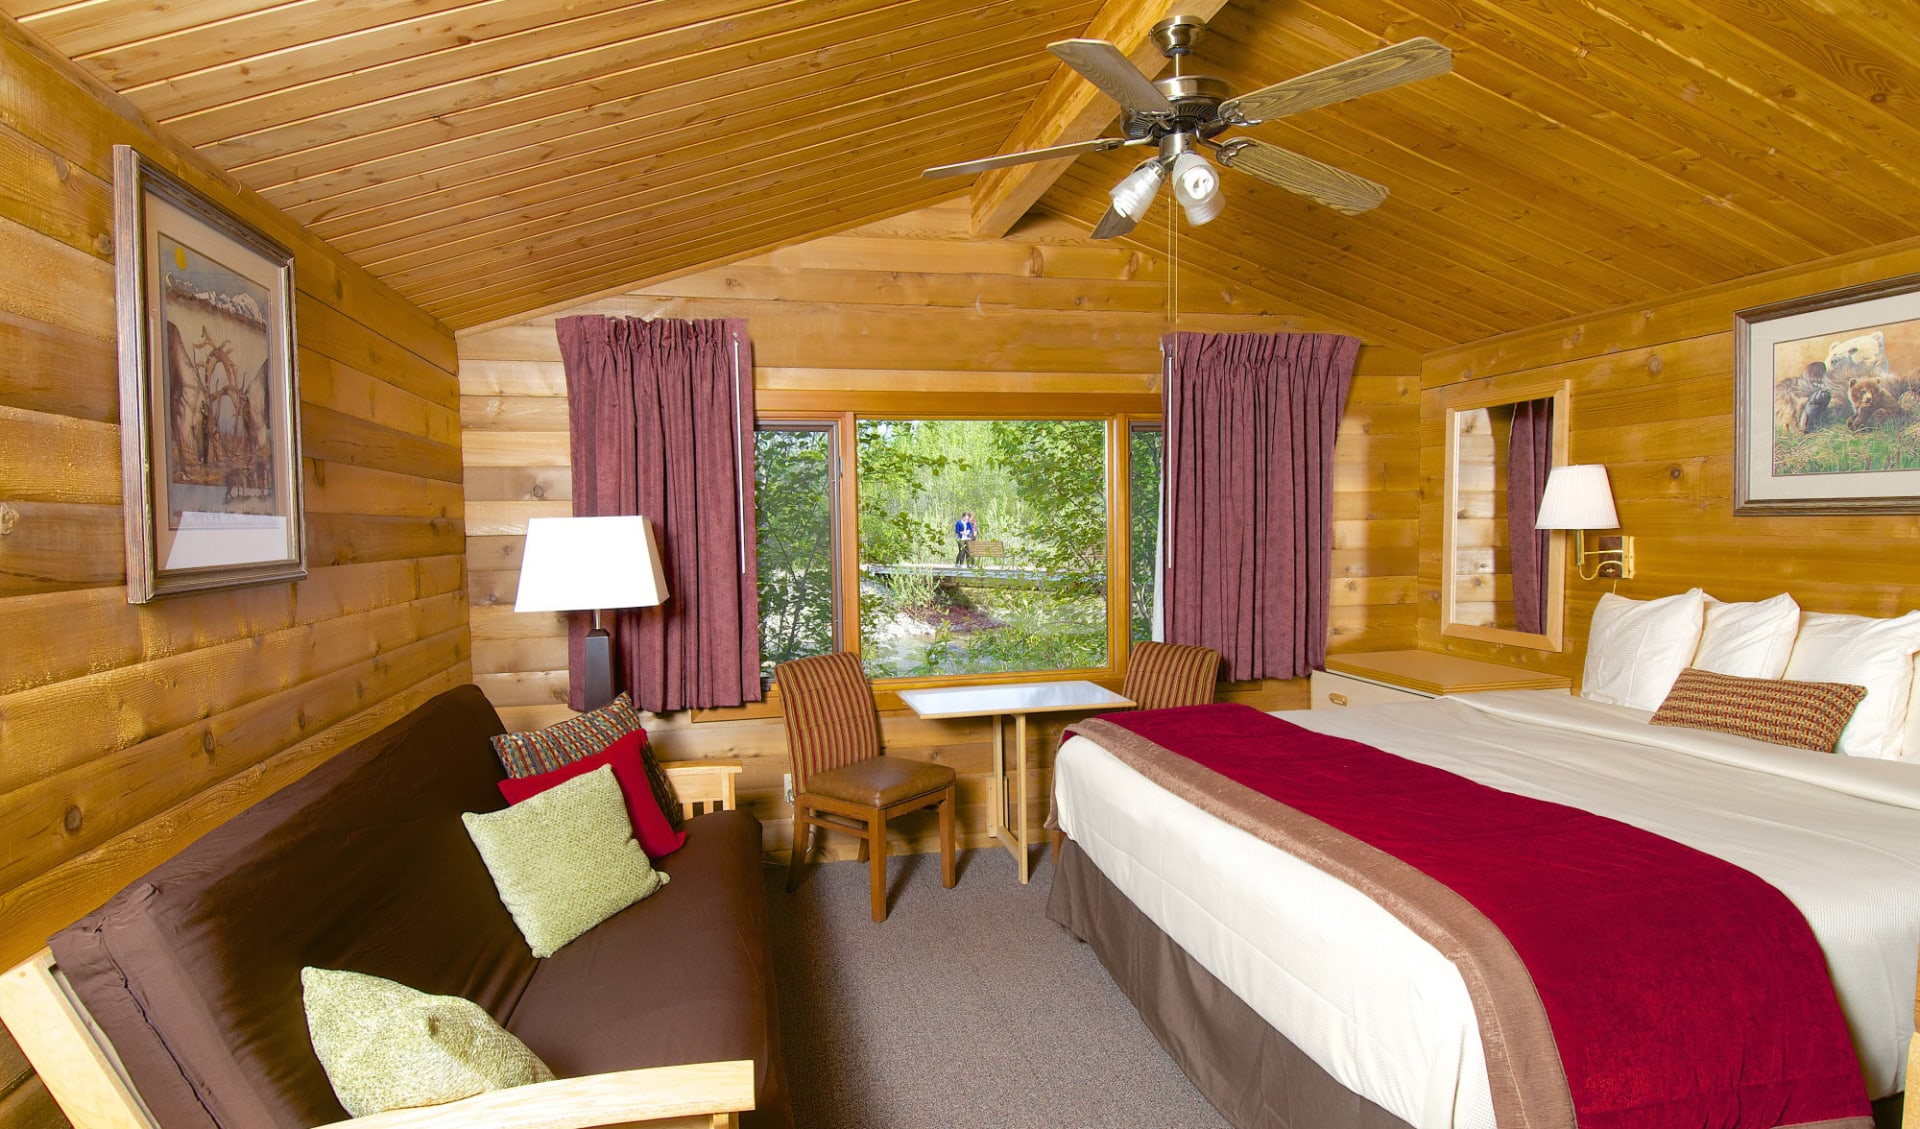 Denali Backcountry Lodge in Denali National Park: denali_backcountry_lodge_DBL Superior King